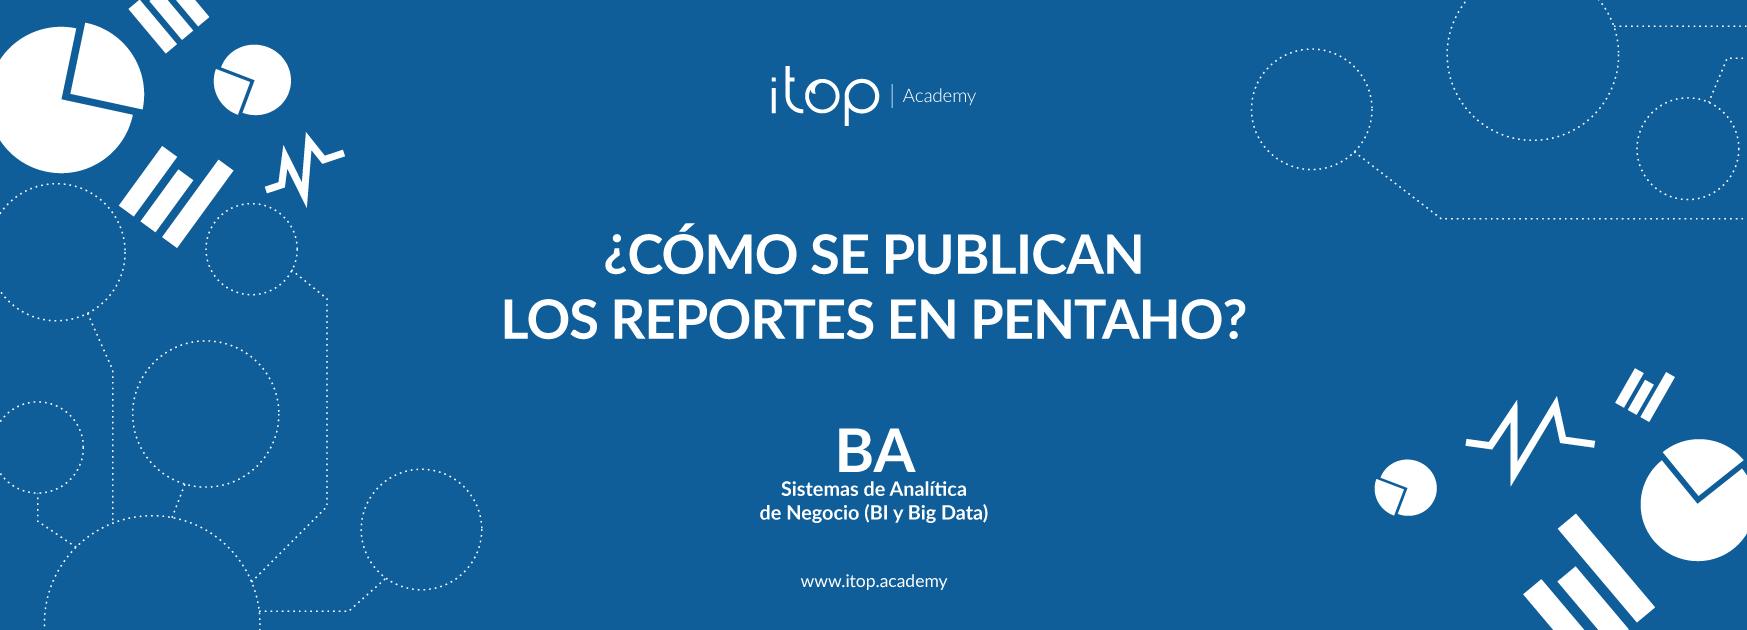 como-se-publican-reportes-pentaho